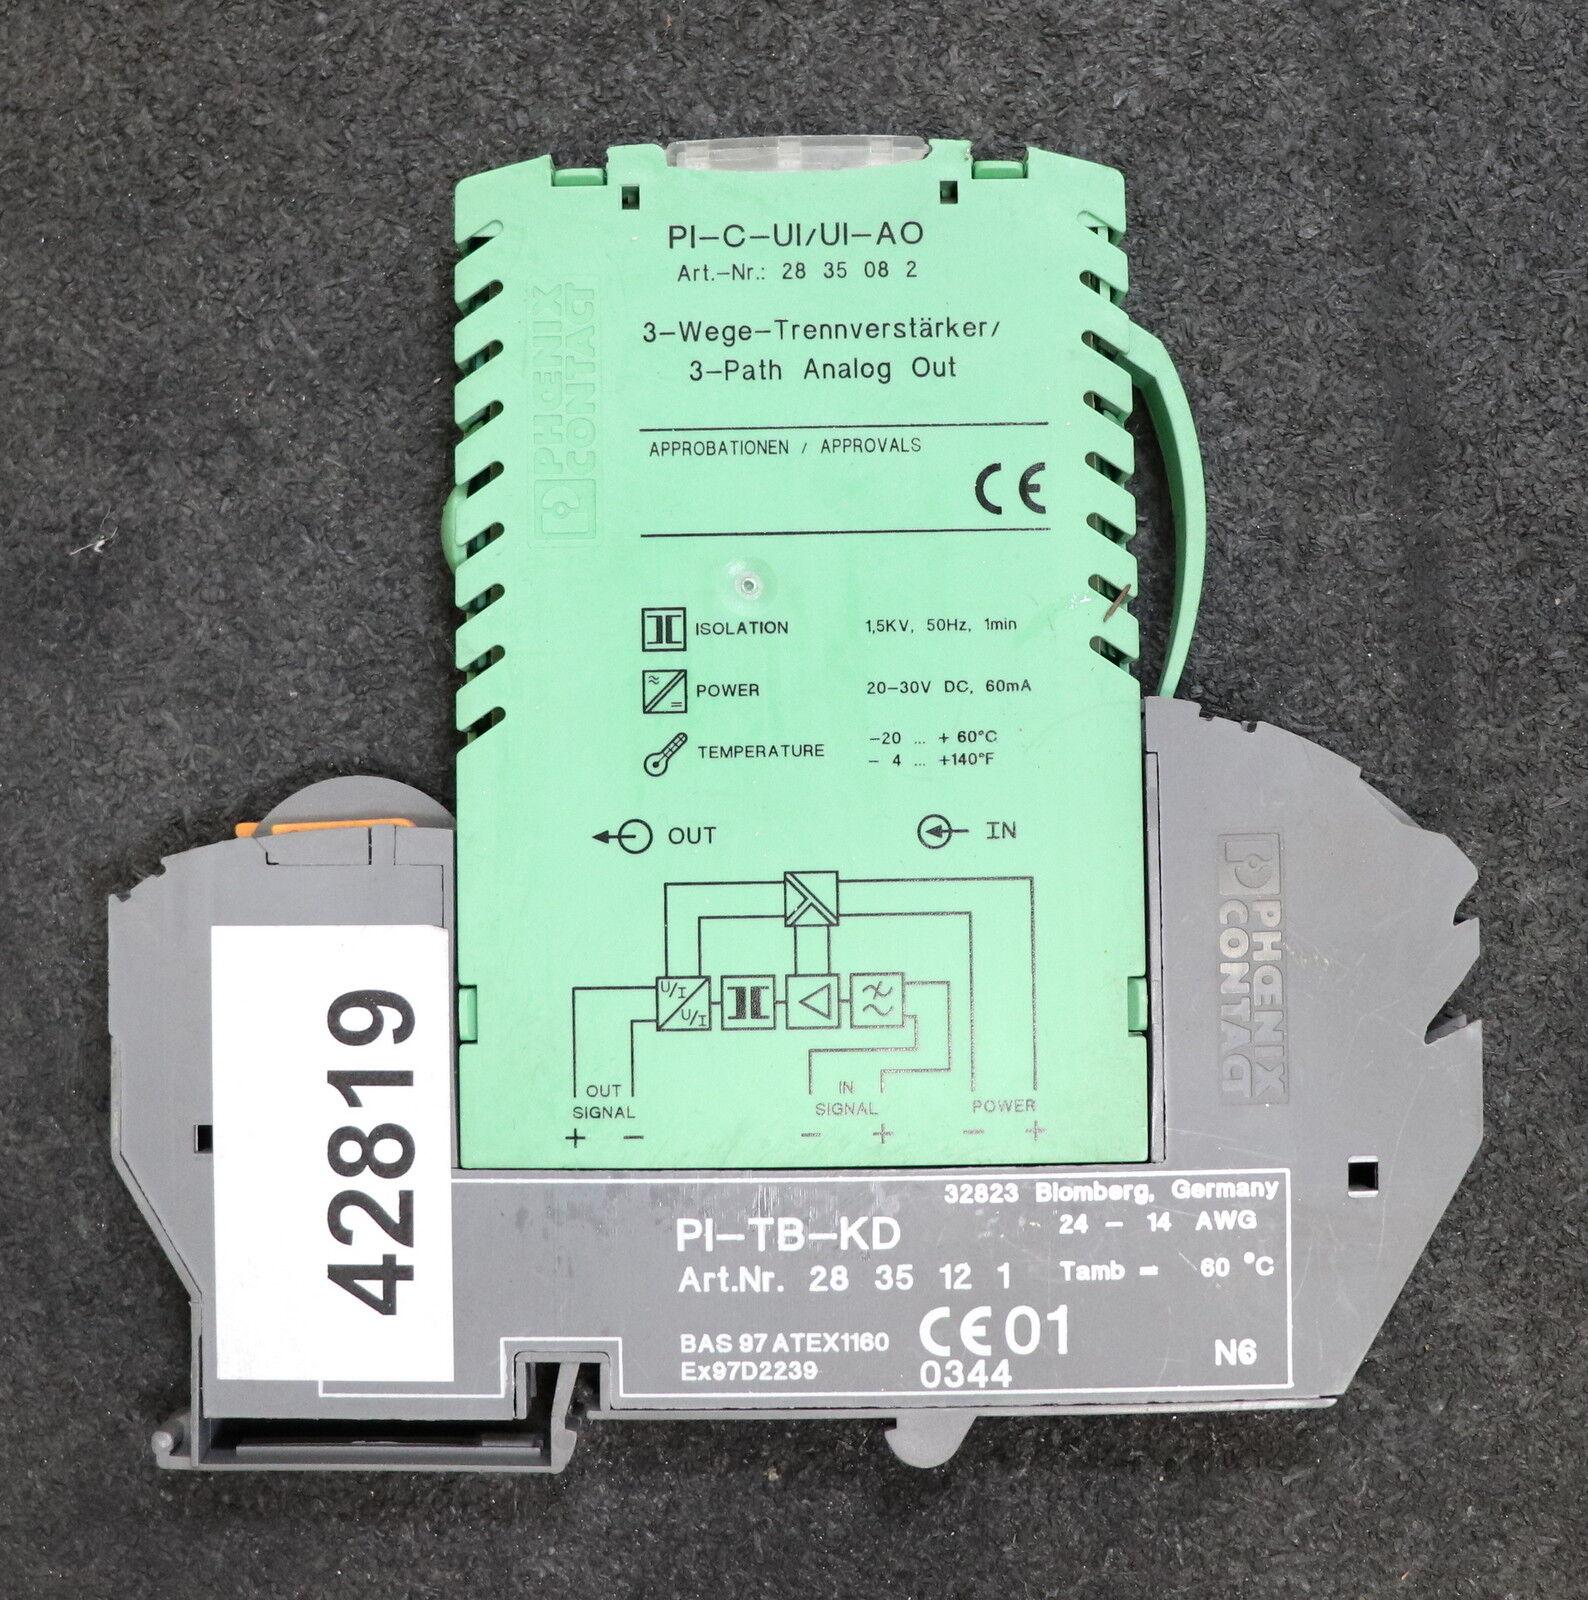 PHOENIX CONTACT 3-Wege-Trennverstärker 3-path analog out PI-C-UI UI-AO